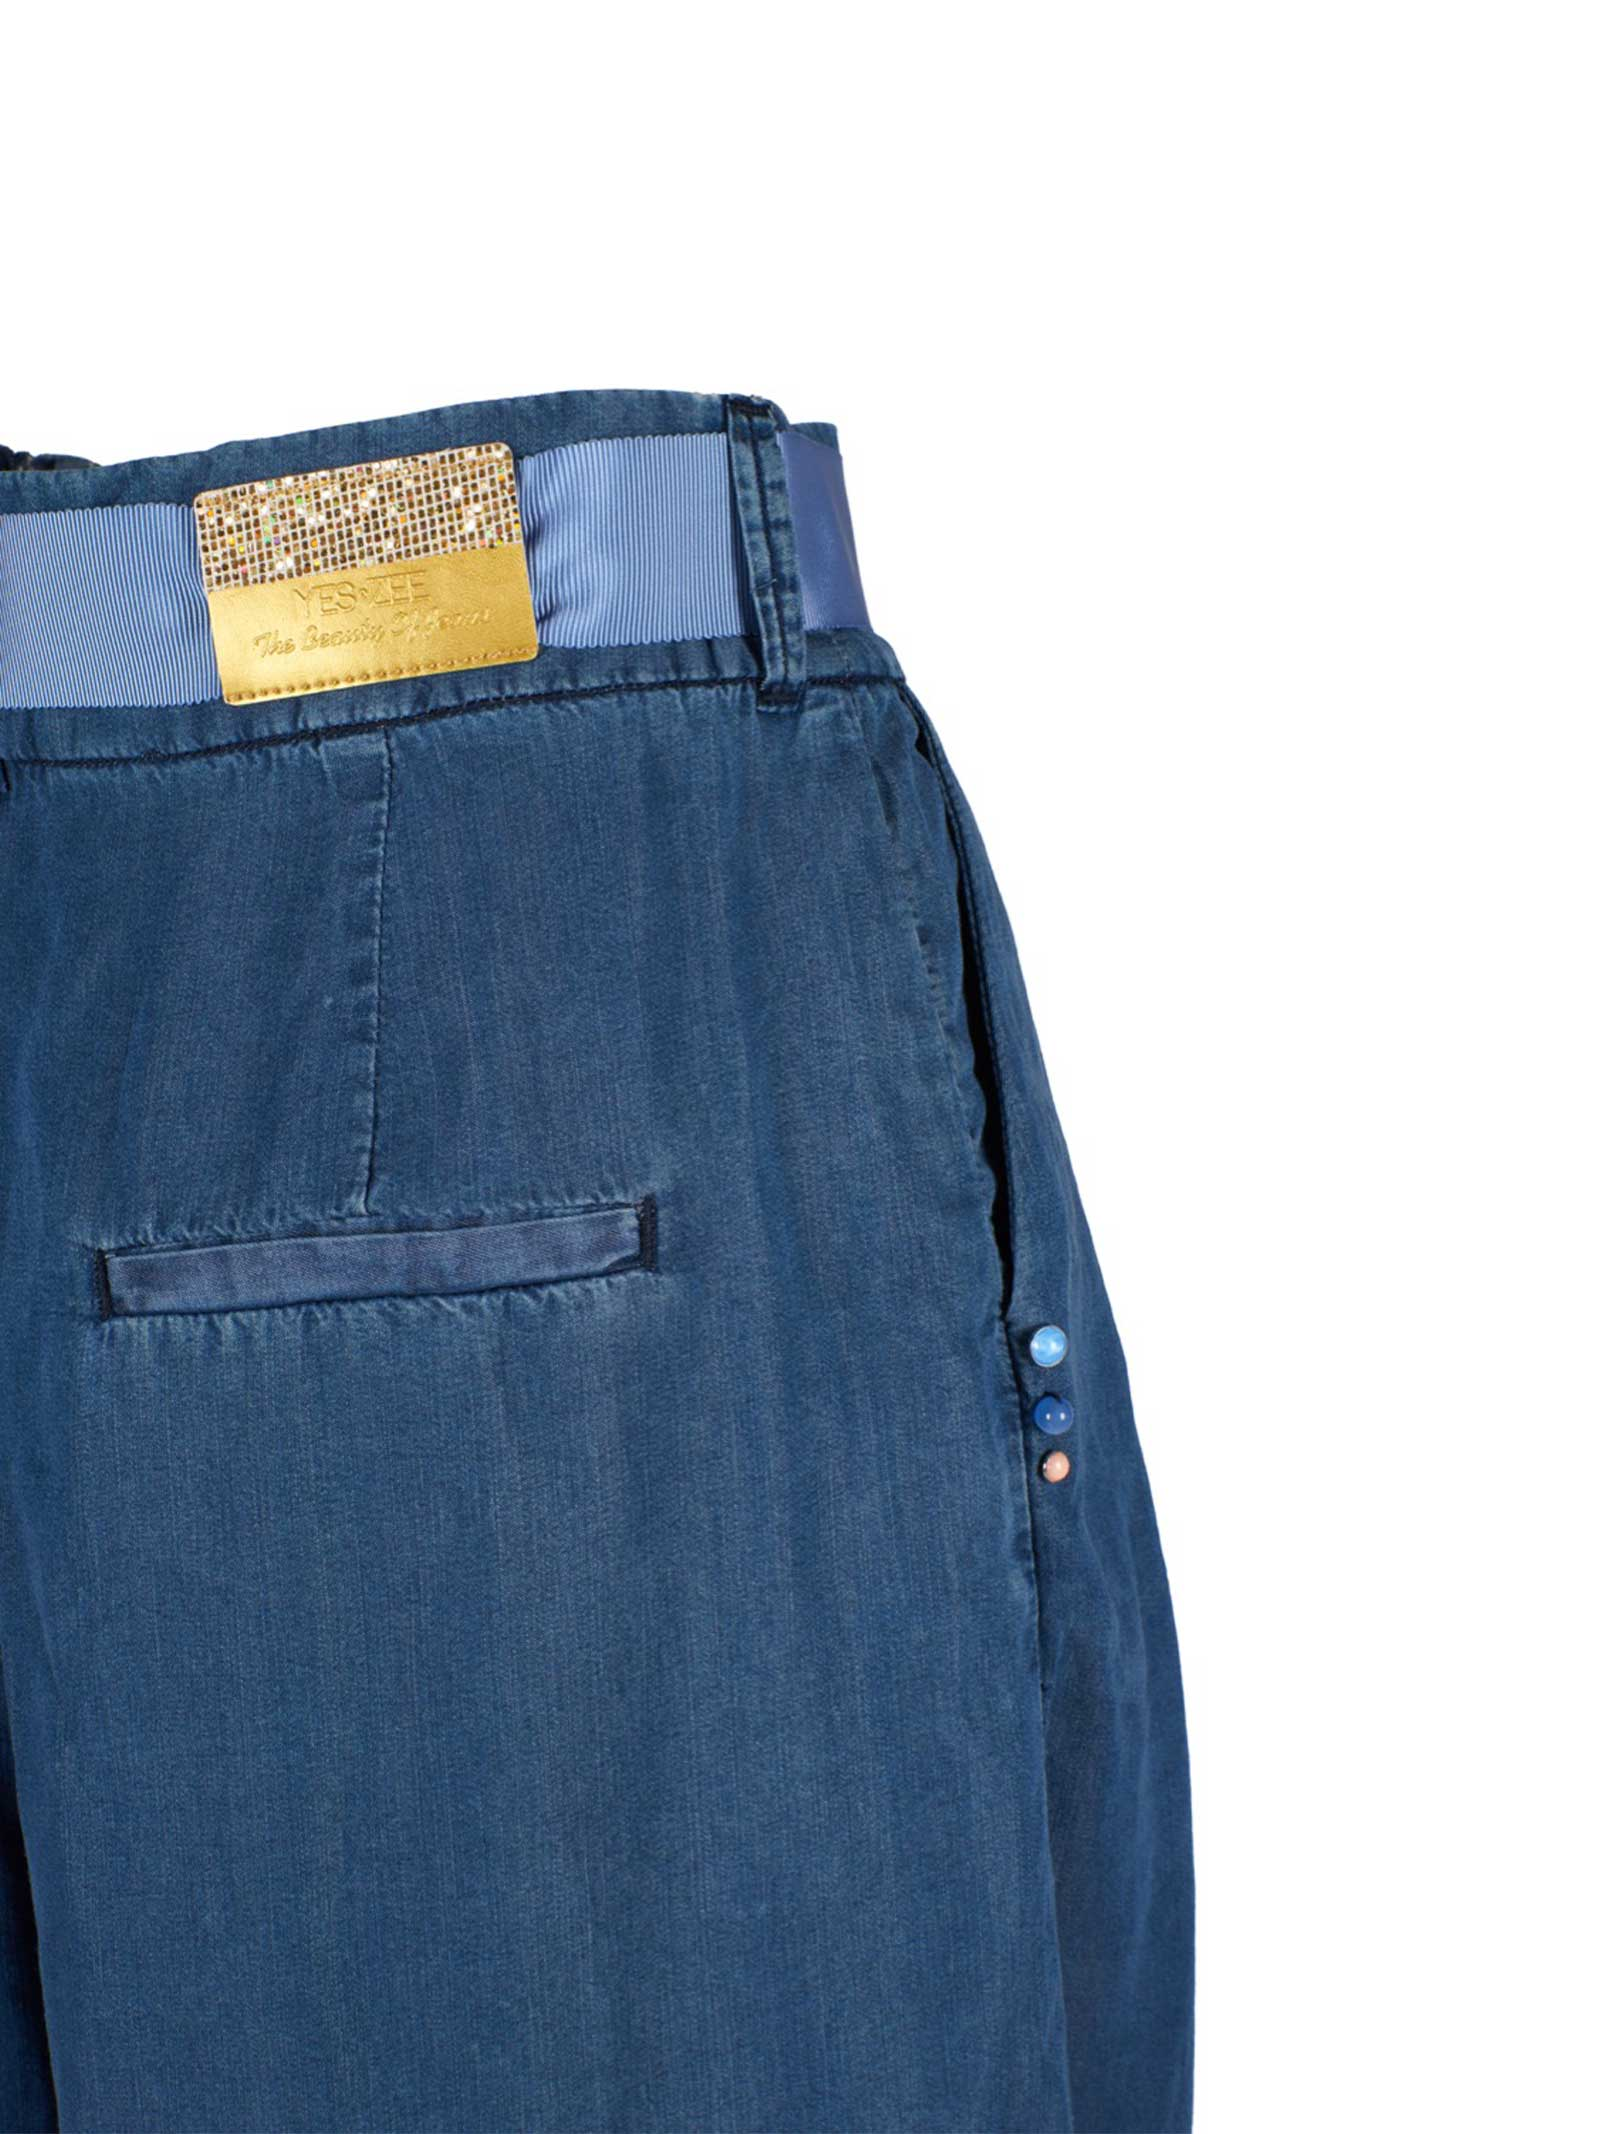 PANTALONI DONNA YES ZEE   Jeans   P383-X805J711